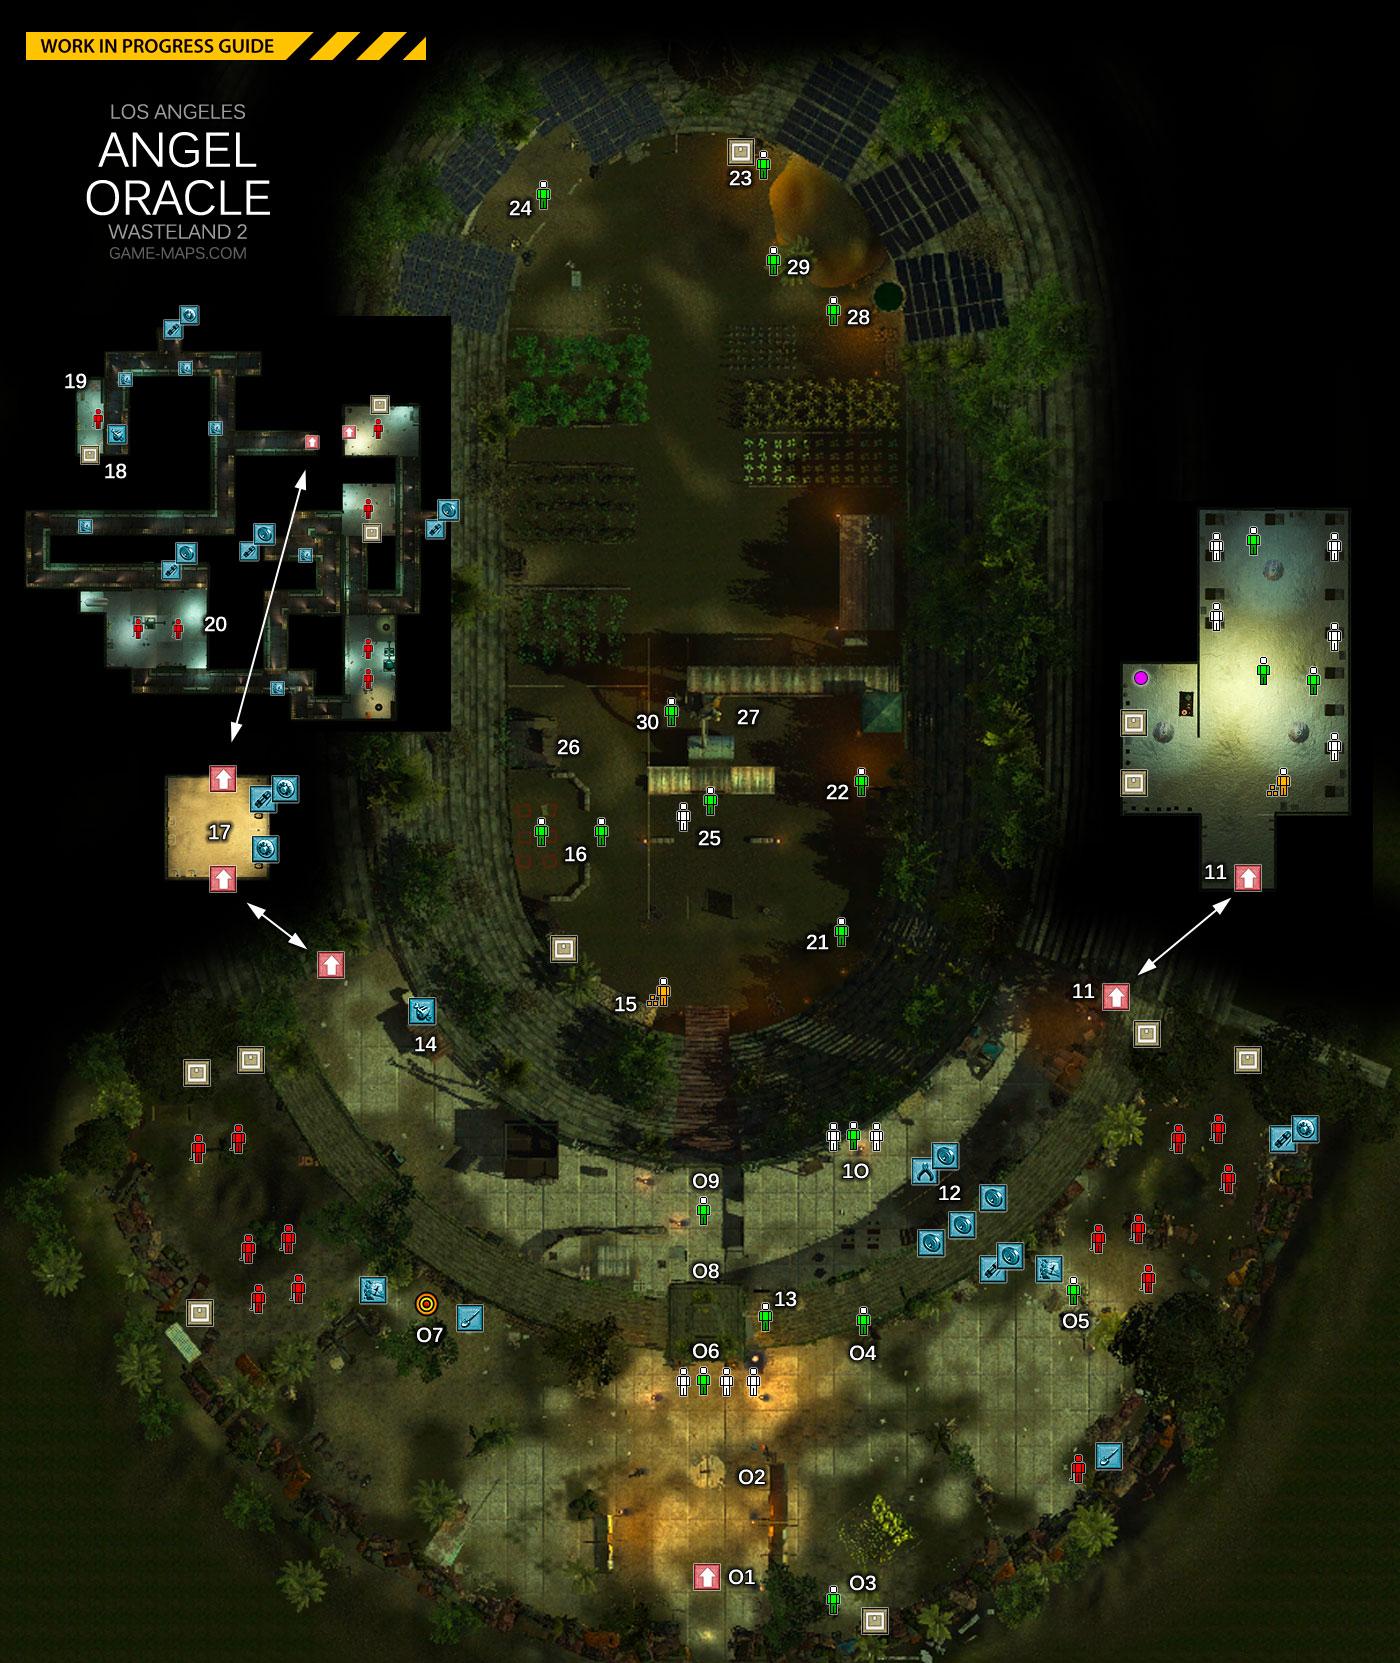 Angel Oracle Los Angeles Wasteland 2 Game Maps Com